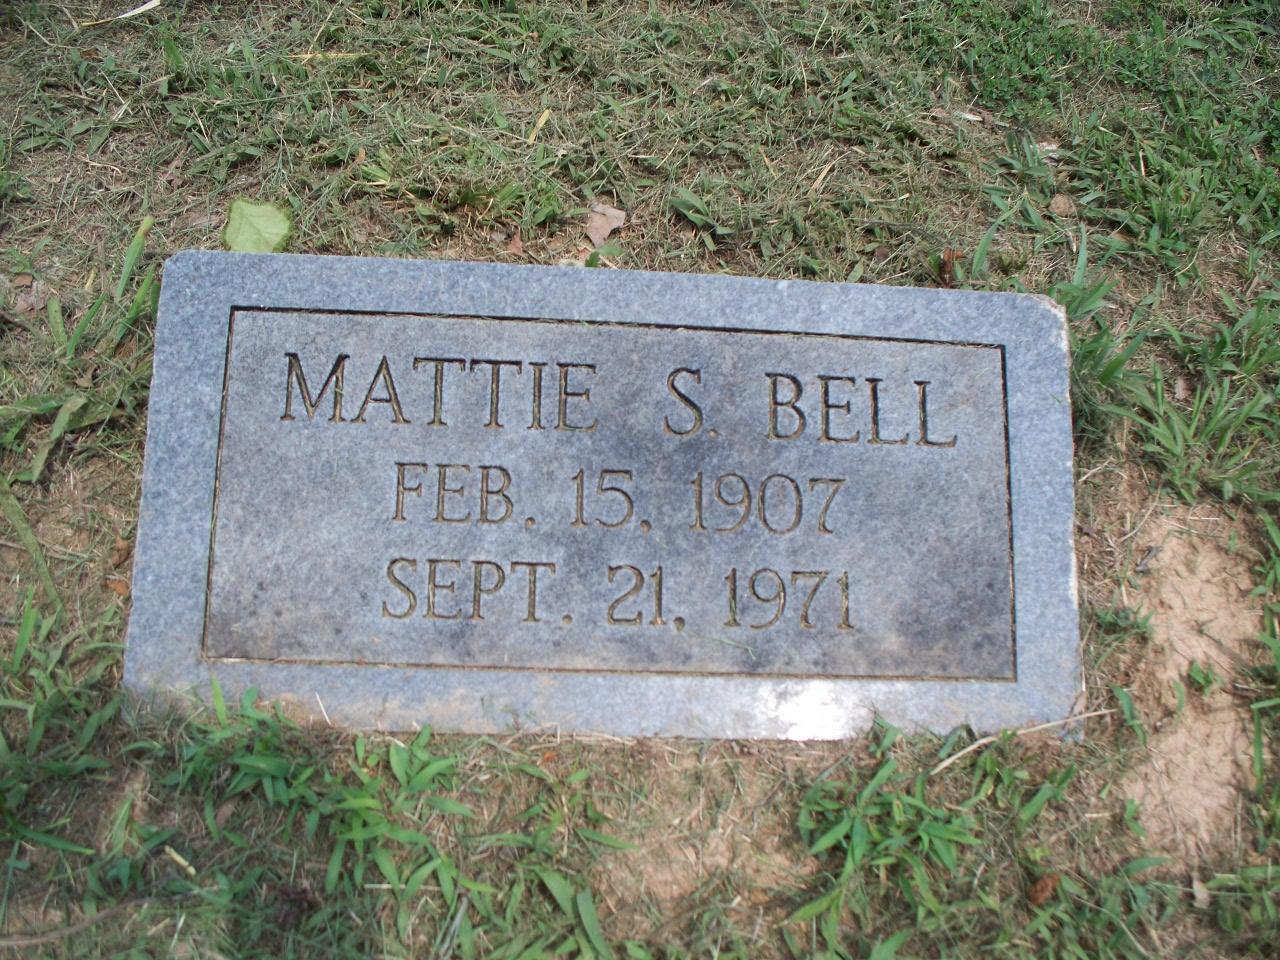 Mattie S Bell